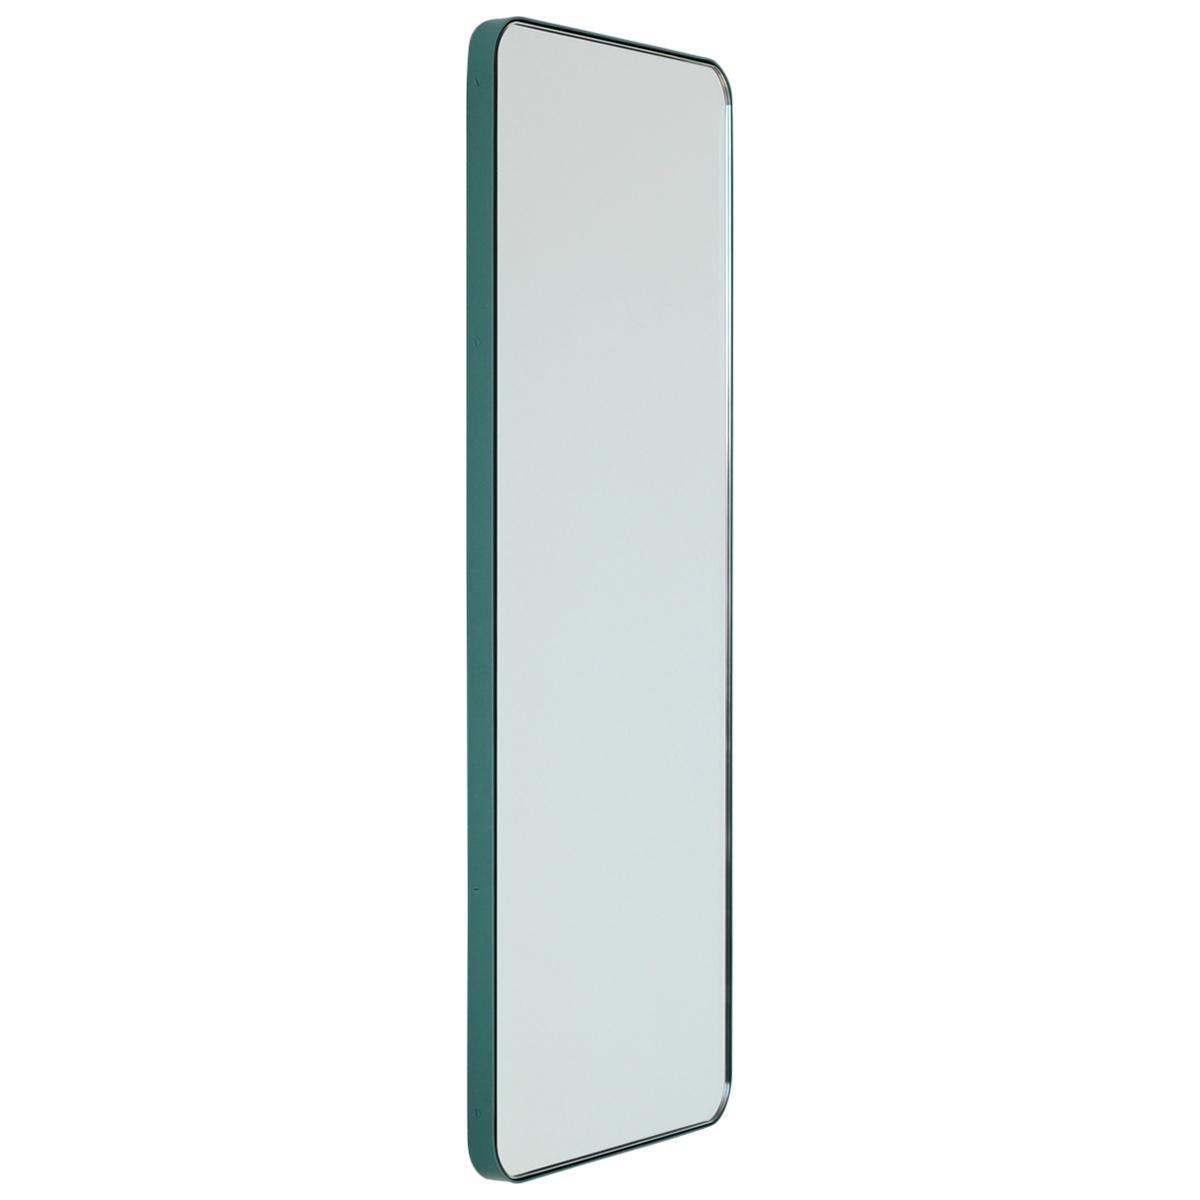 Quadris™ Rectangular Narrow Mirror with a Mint Turquoise Frame